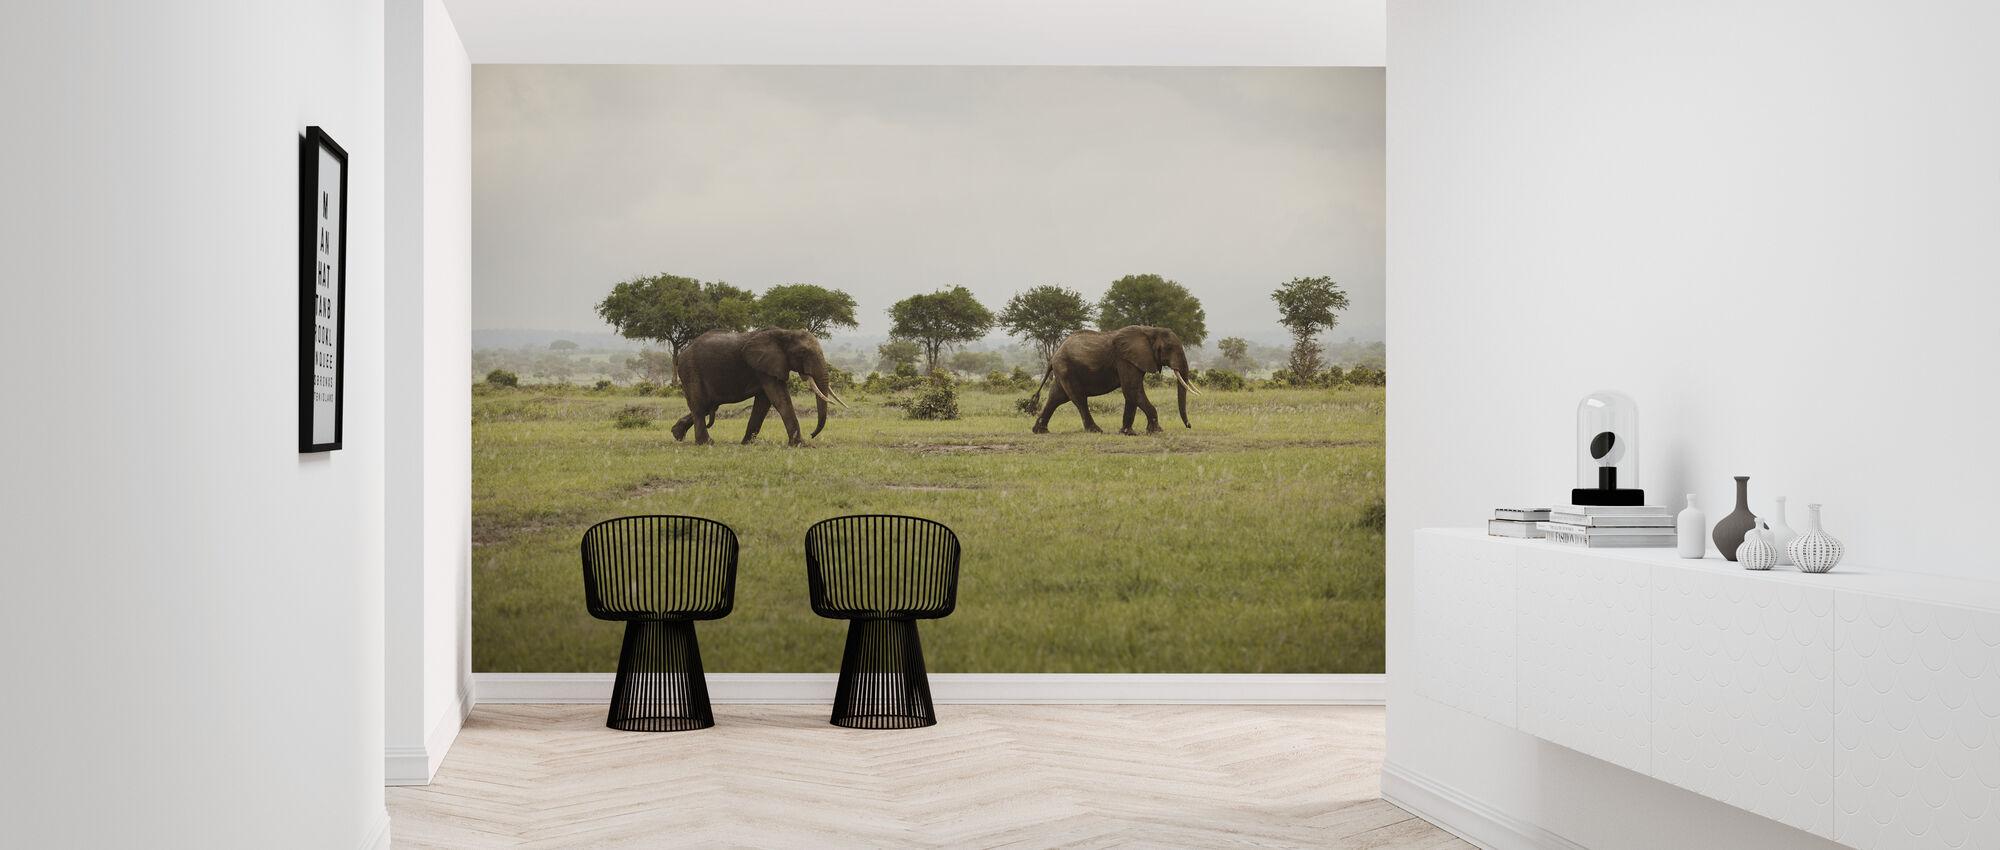 Elephants in National Park - Wallpaper - Hallway